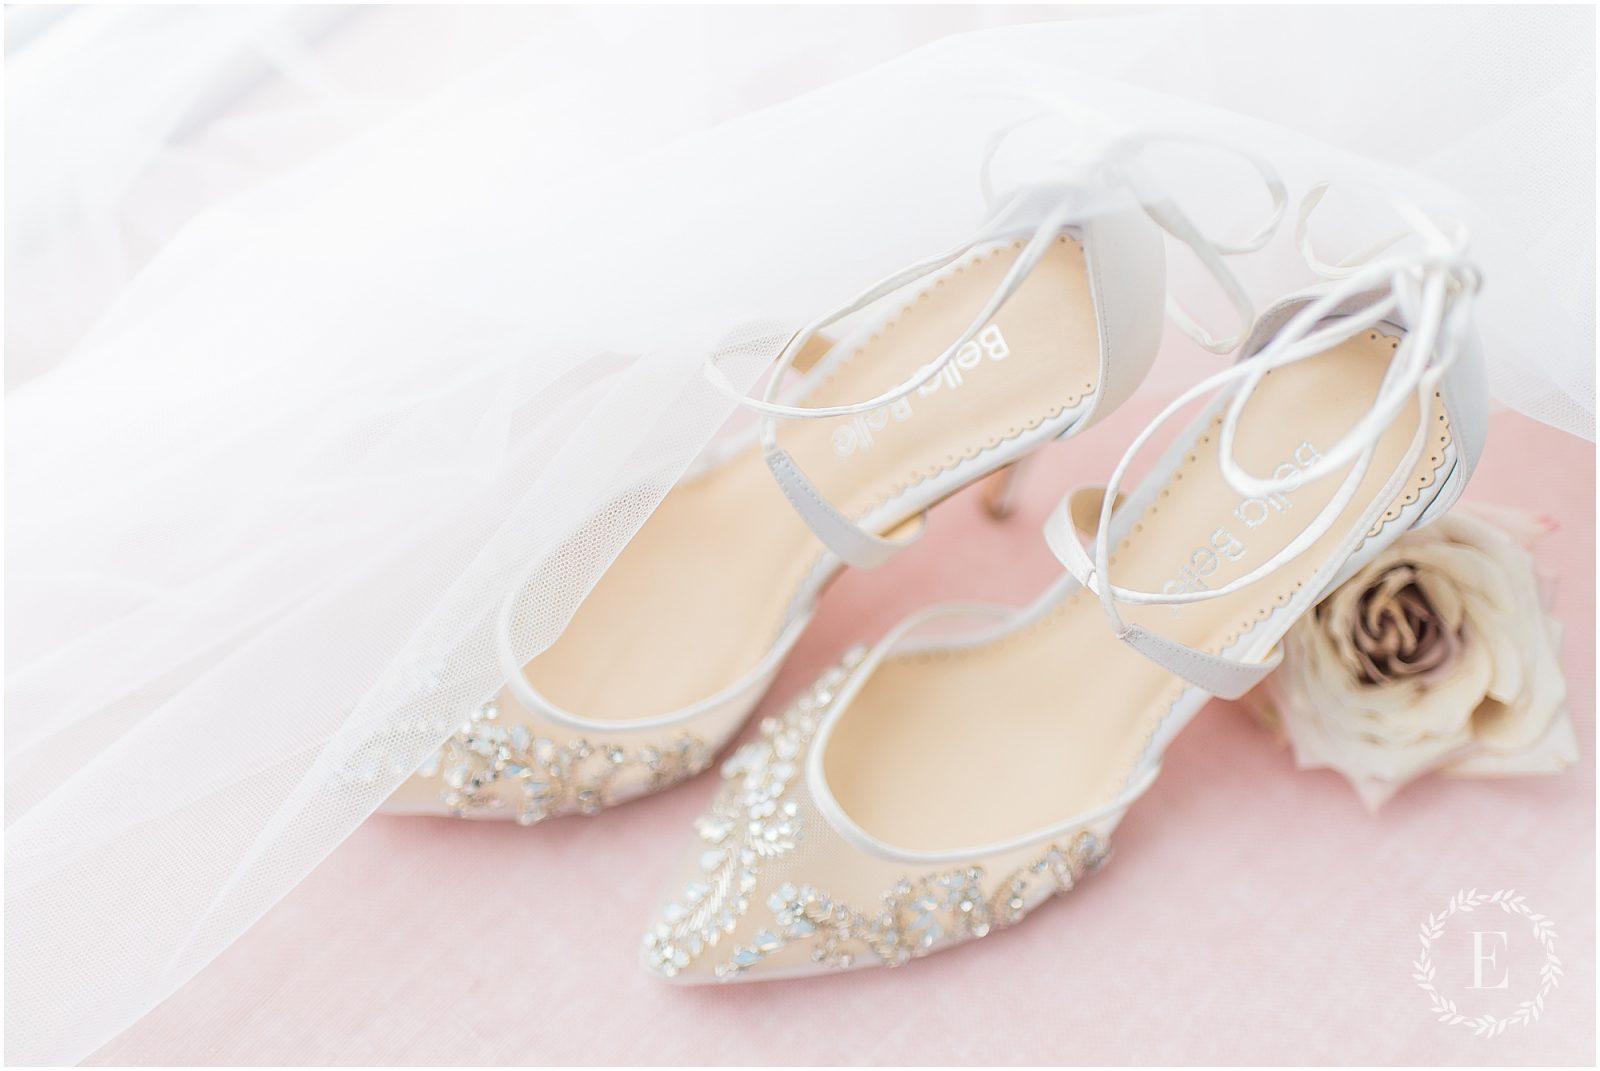 42 - Bella Belle for Fairy Dreams Bridal - PhotosbyEmmaH 2019.jpg